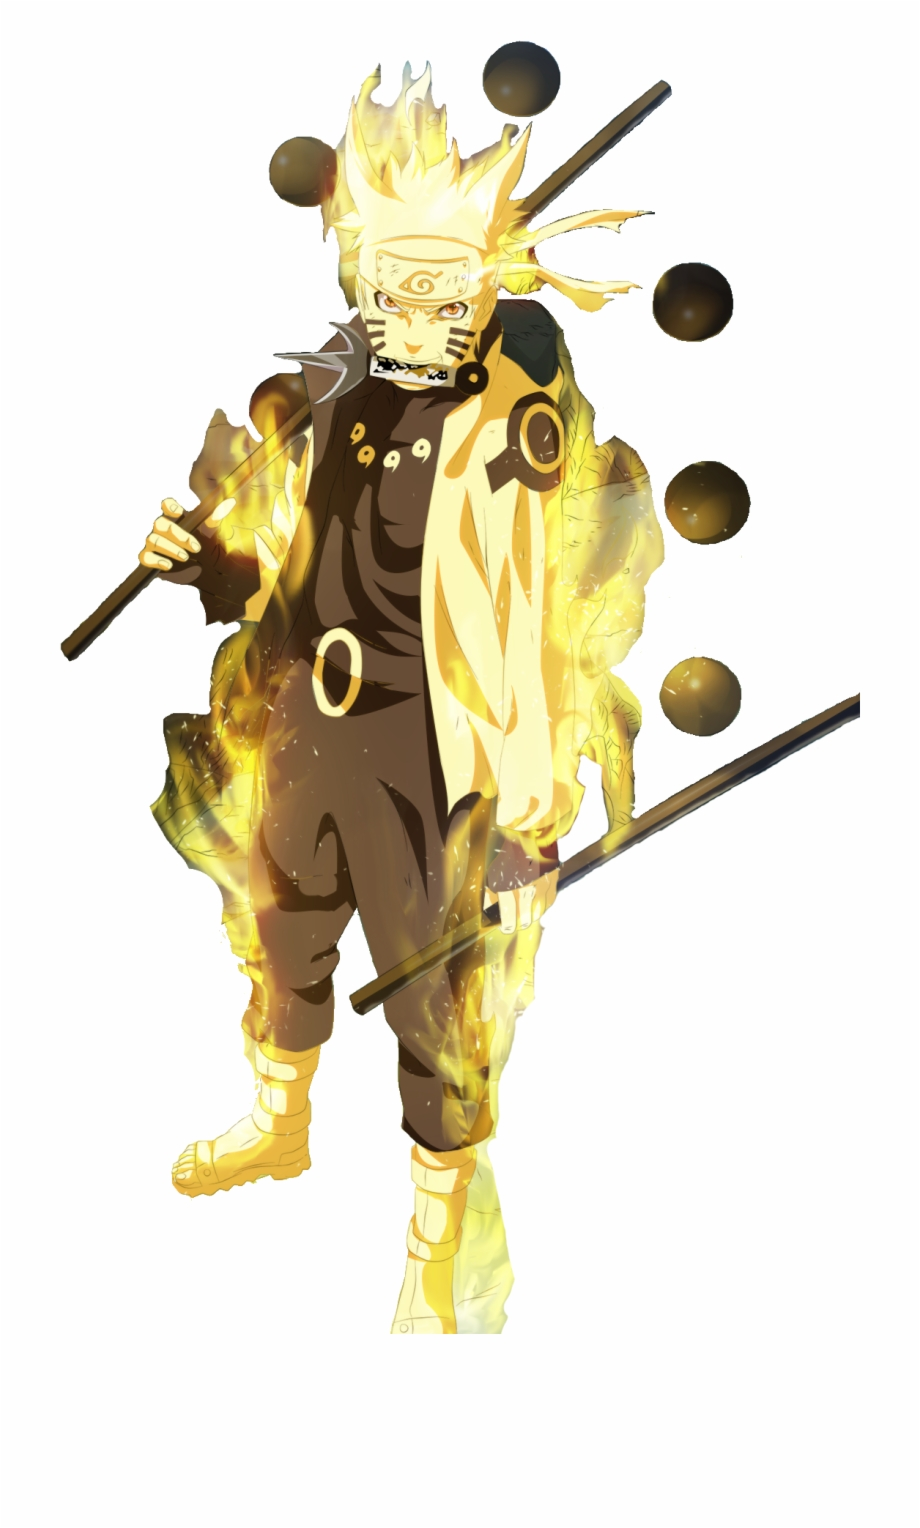 Naruto Sage Mode Png Naruto Sage Kyuubi Mode Six Paths Transparent Png Download 2261450 Vippng